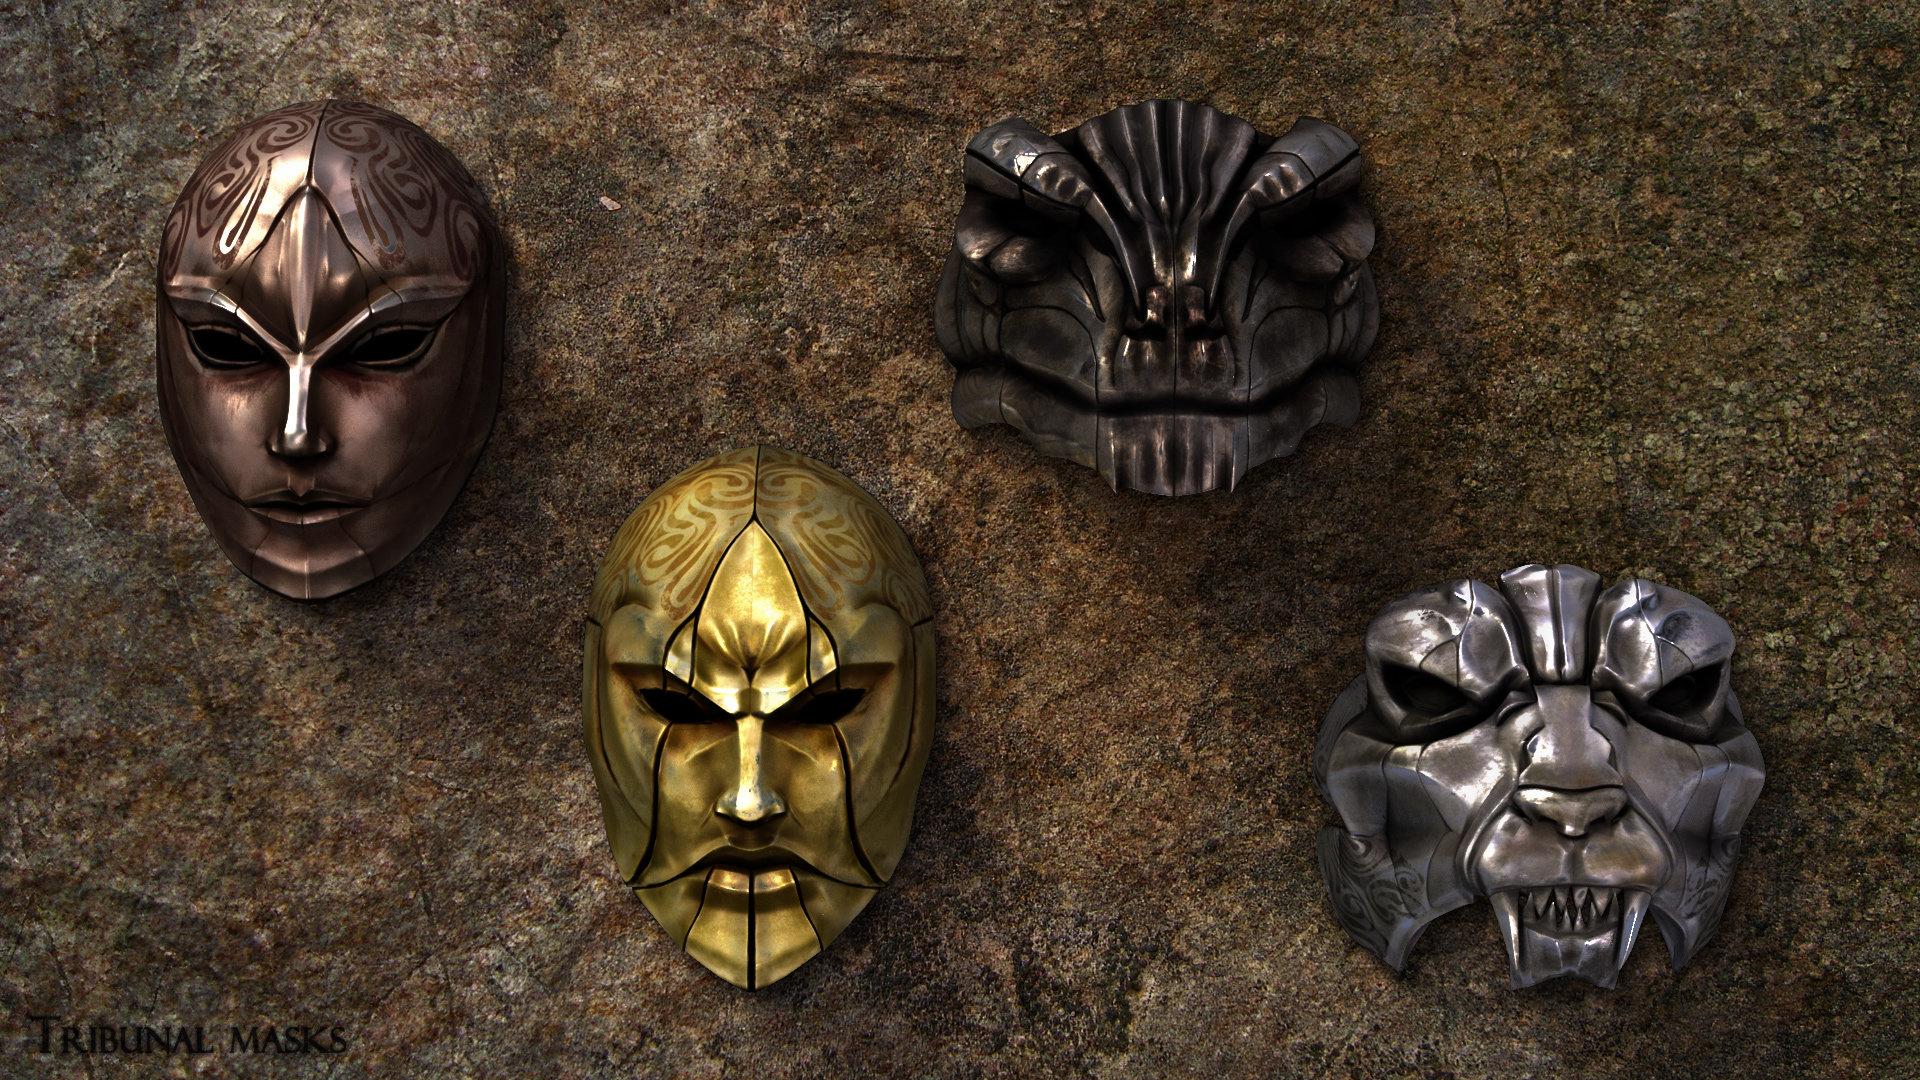 Thomas veyrat 020 tom tribunal masks